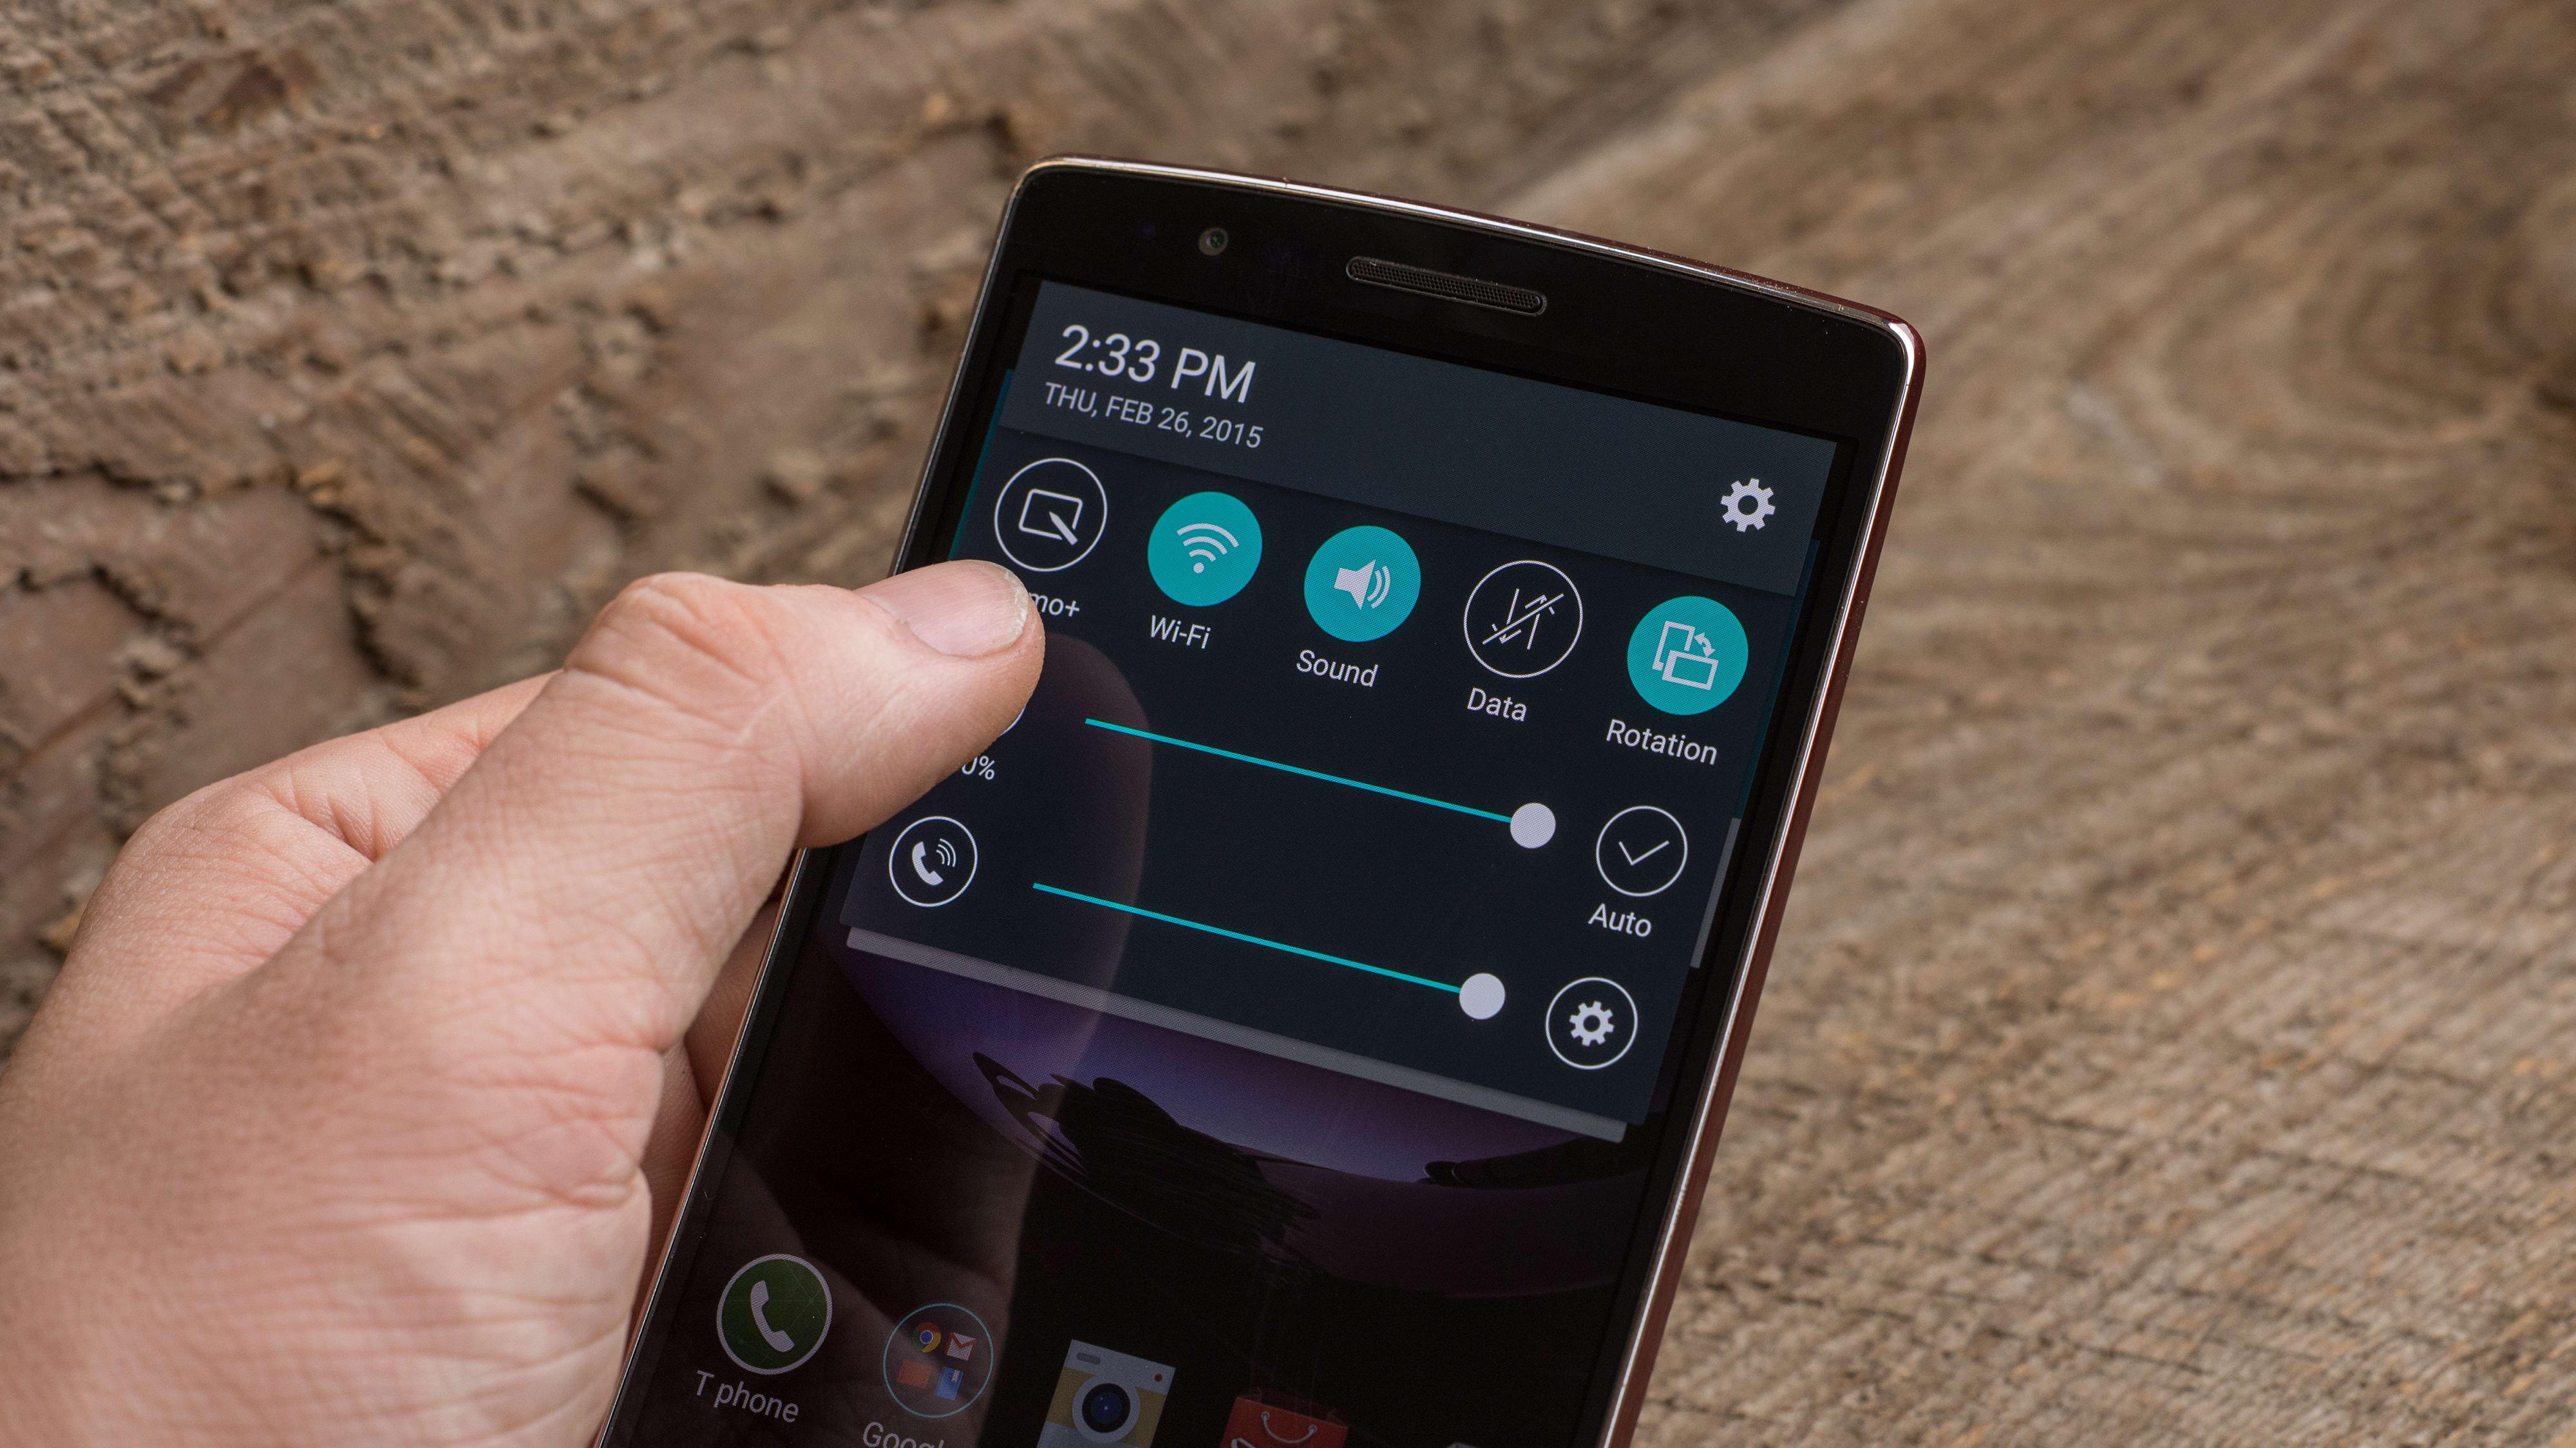 A photograph of the LG G Flex 2's power menu.